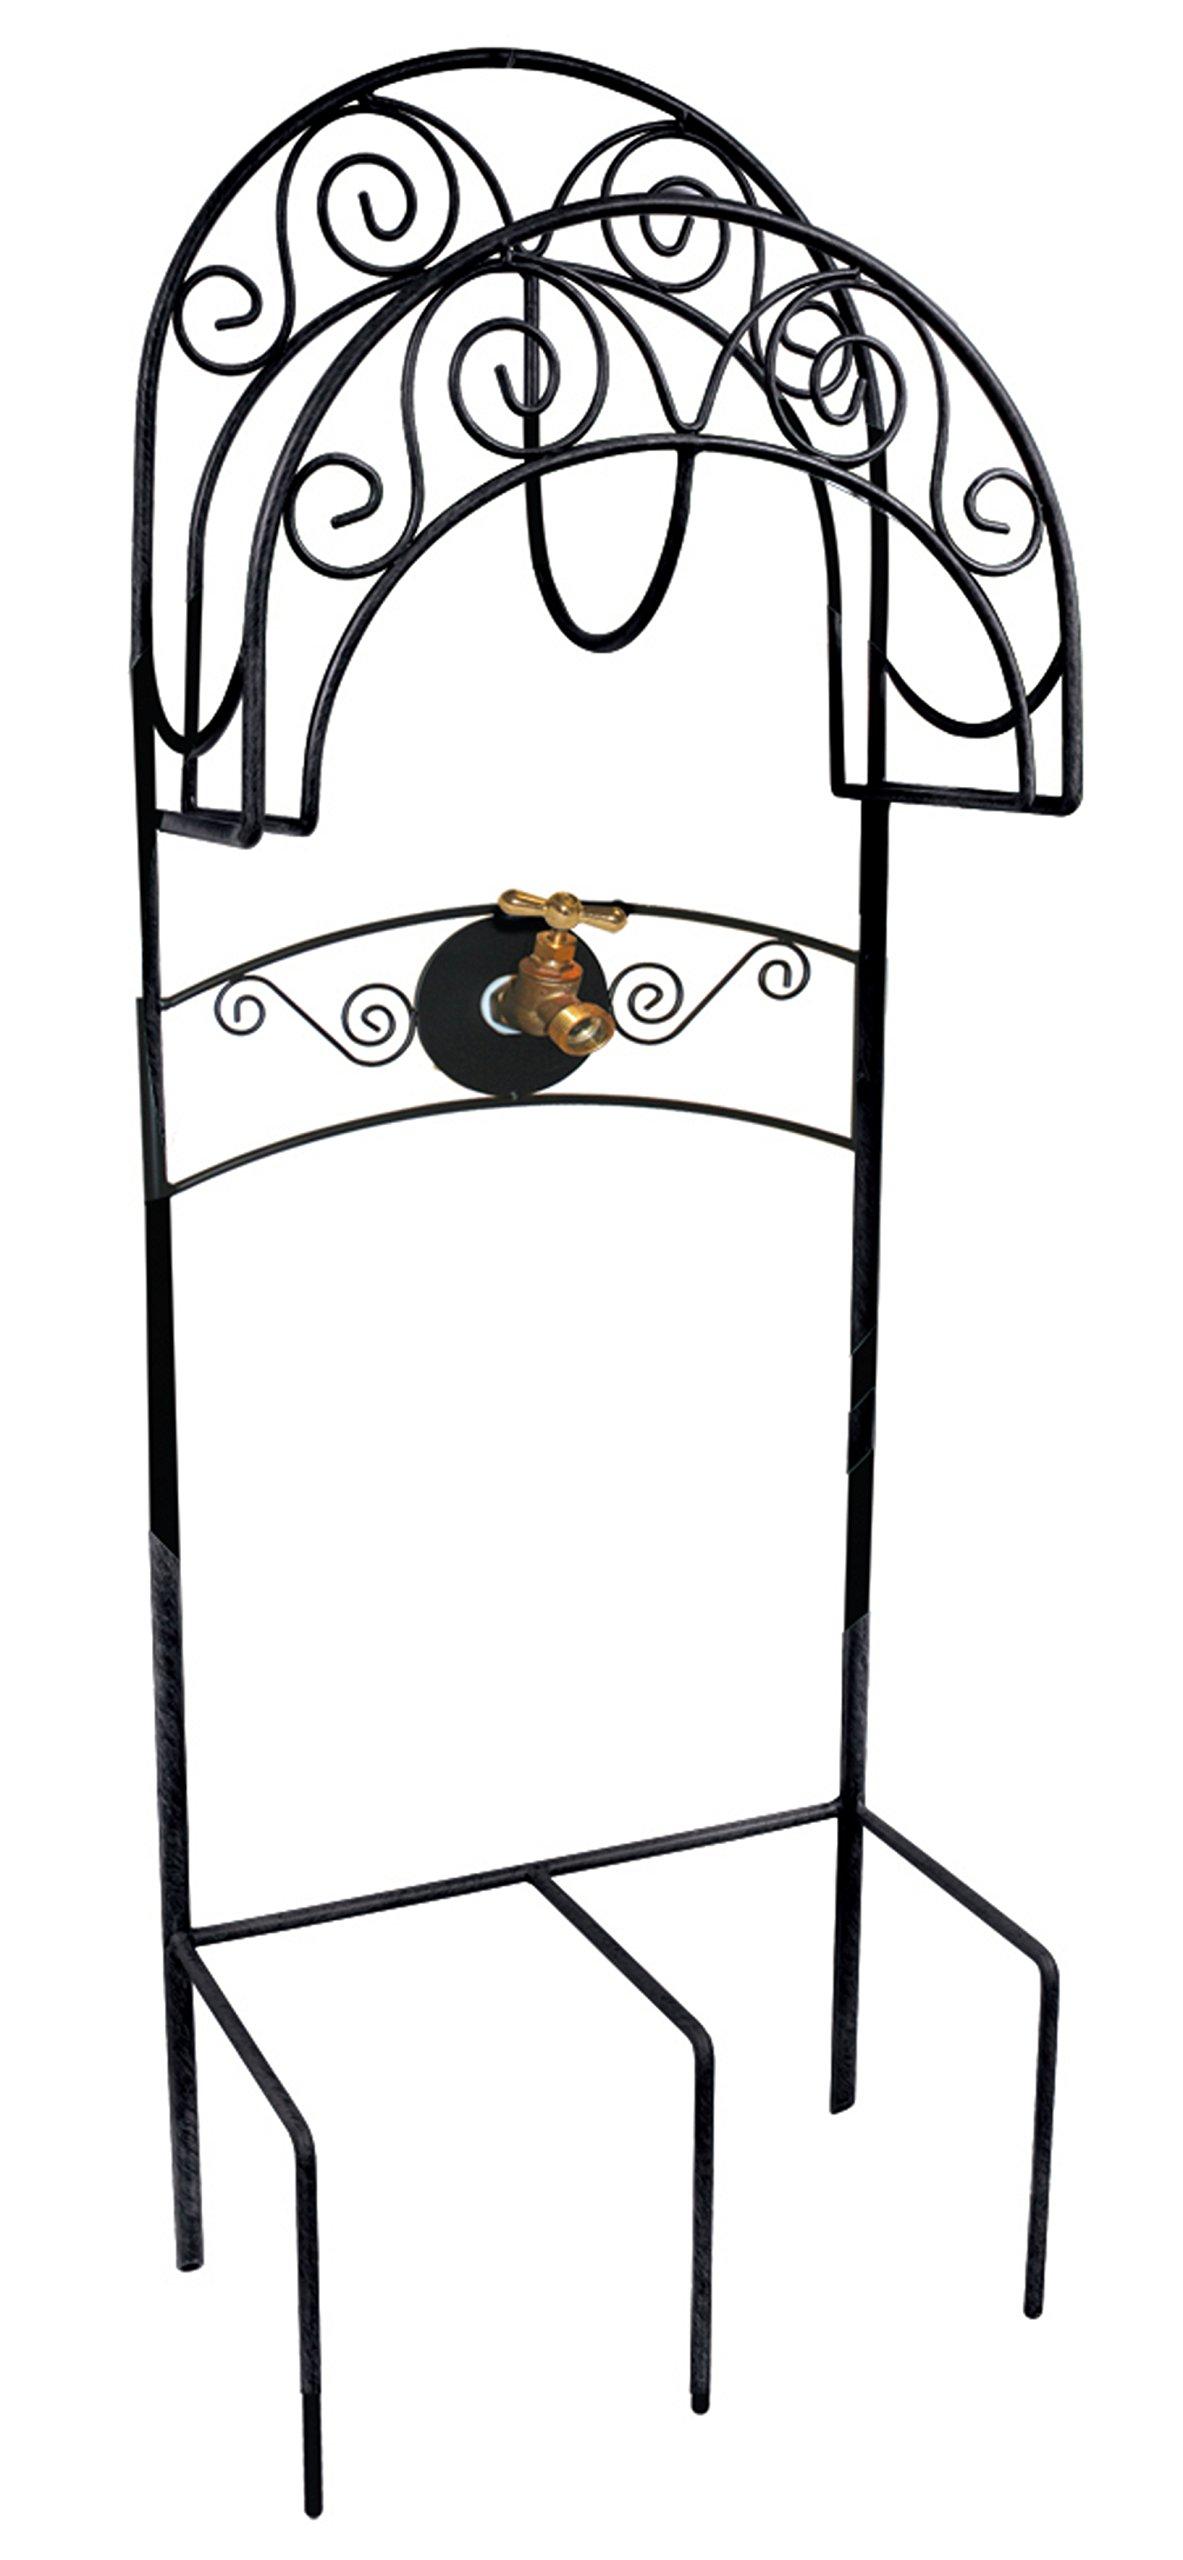 Liberty Garden 640 Carrington Decorative Metal Hose, Stand w/Bib Black